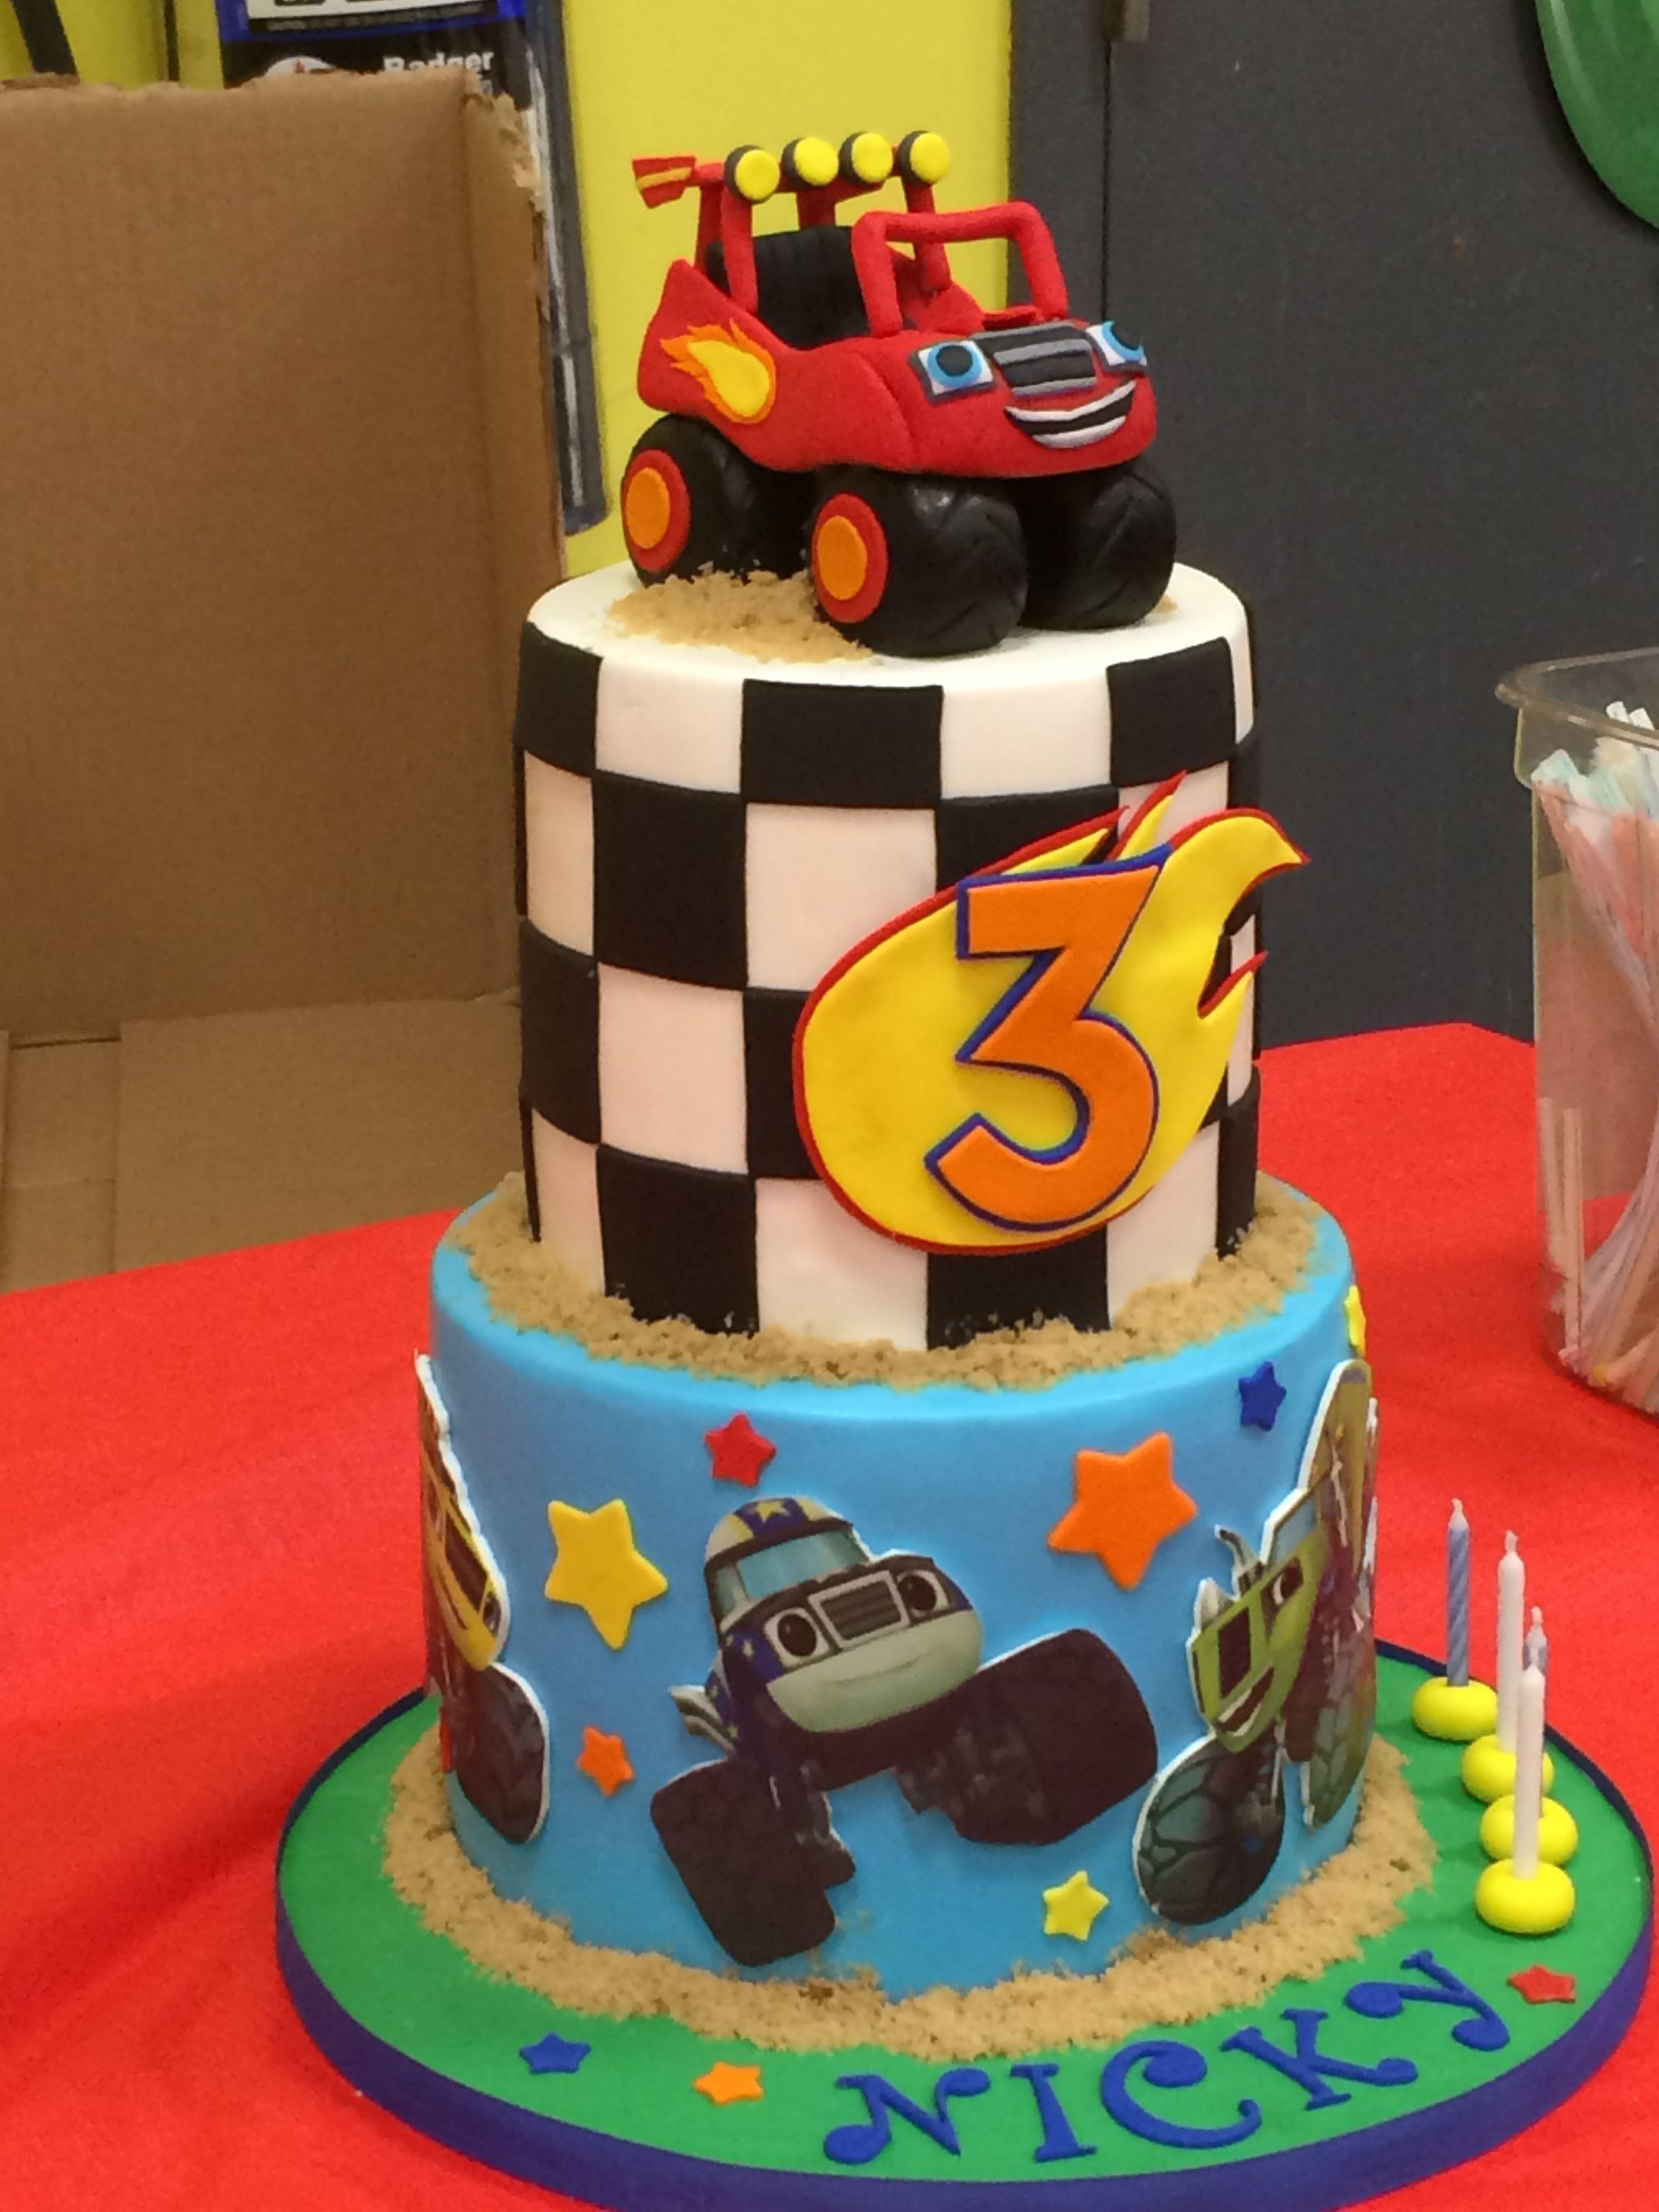 Blaze Birthday Cake Blaze Birthday Cake Blaze Birthday Blaze